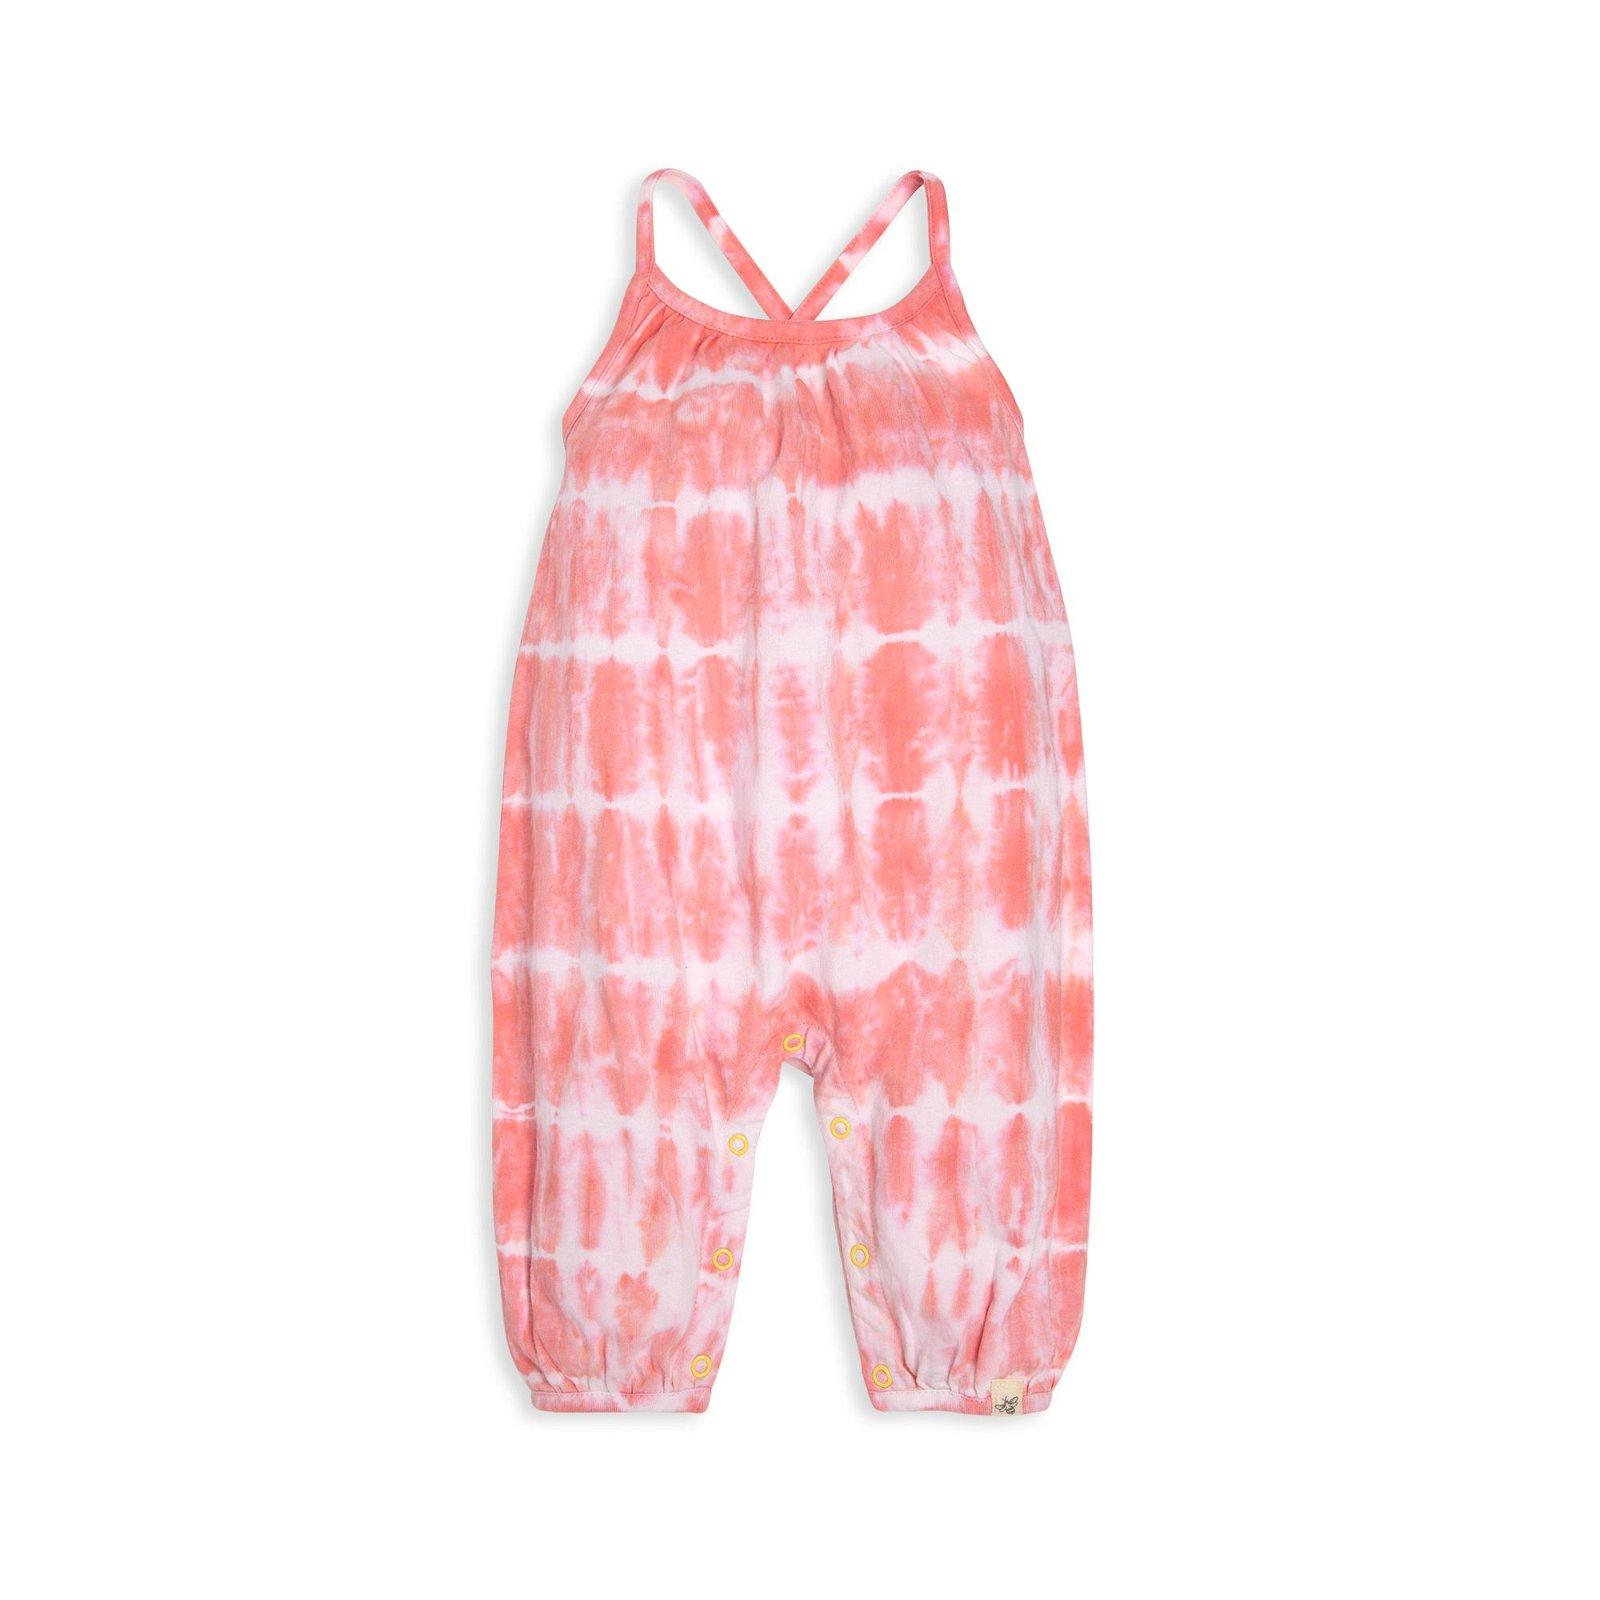 Tie-Dye Organic Baby Bubble Jumpsuit